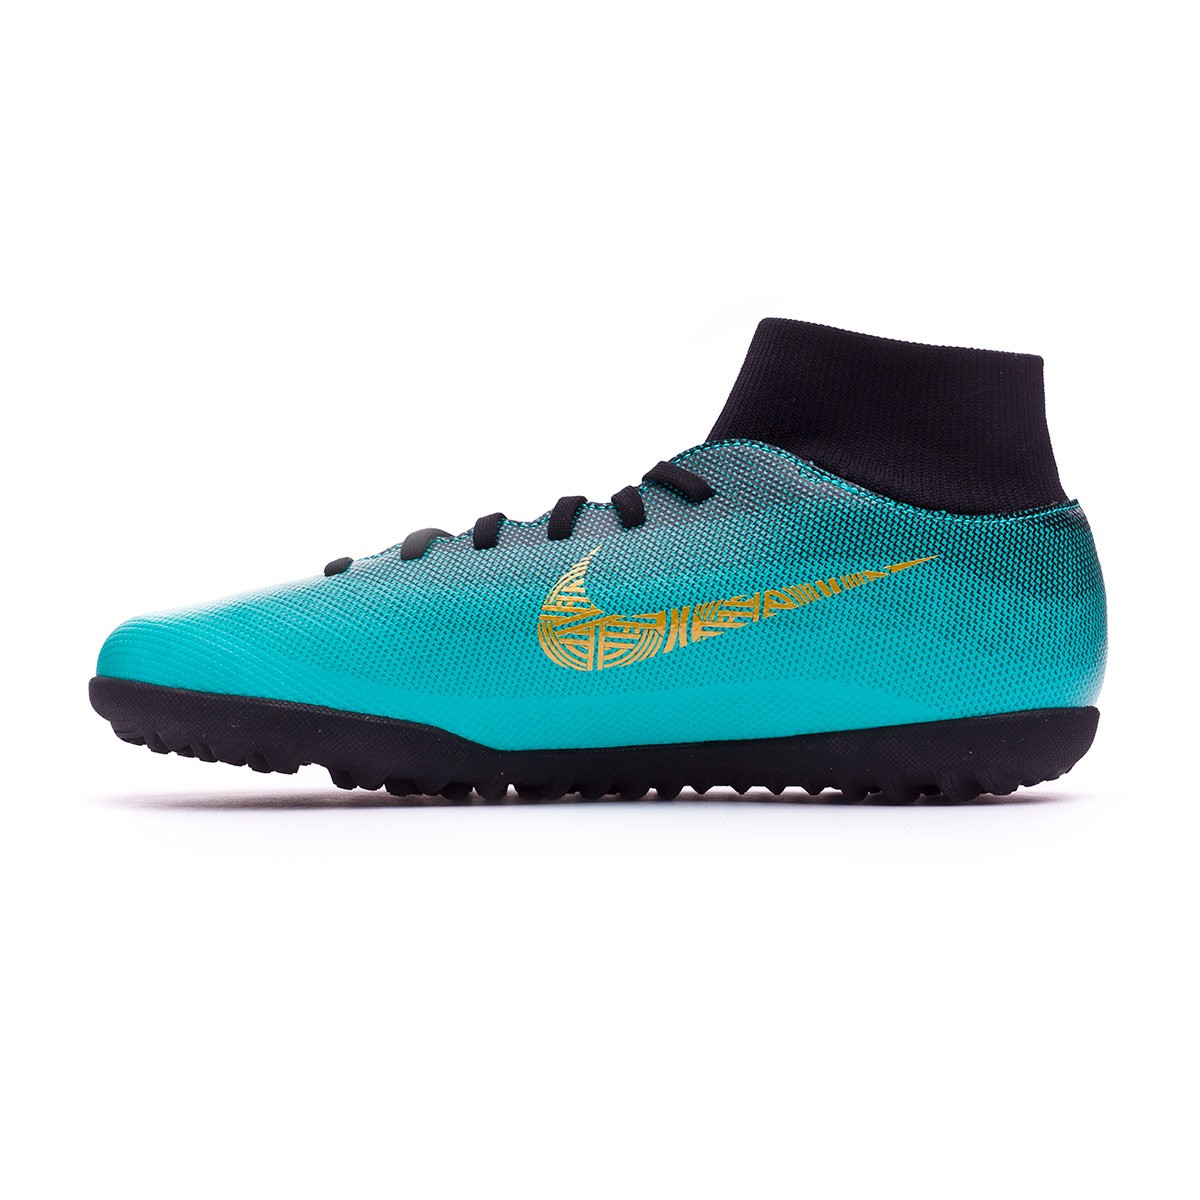 d95f17c58a9 Sapatilhas Nike Mercurial SuperflyX VI Club CR7 Turf Clear jade-Metallic  vivid gold-Black - Loja de futebol Fútbol Emotion